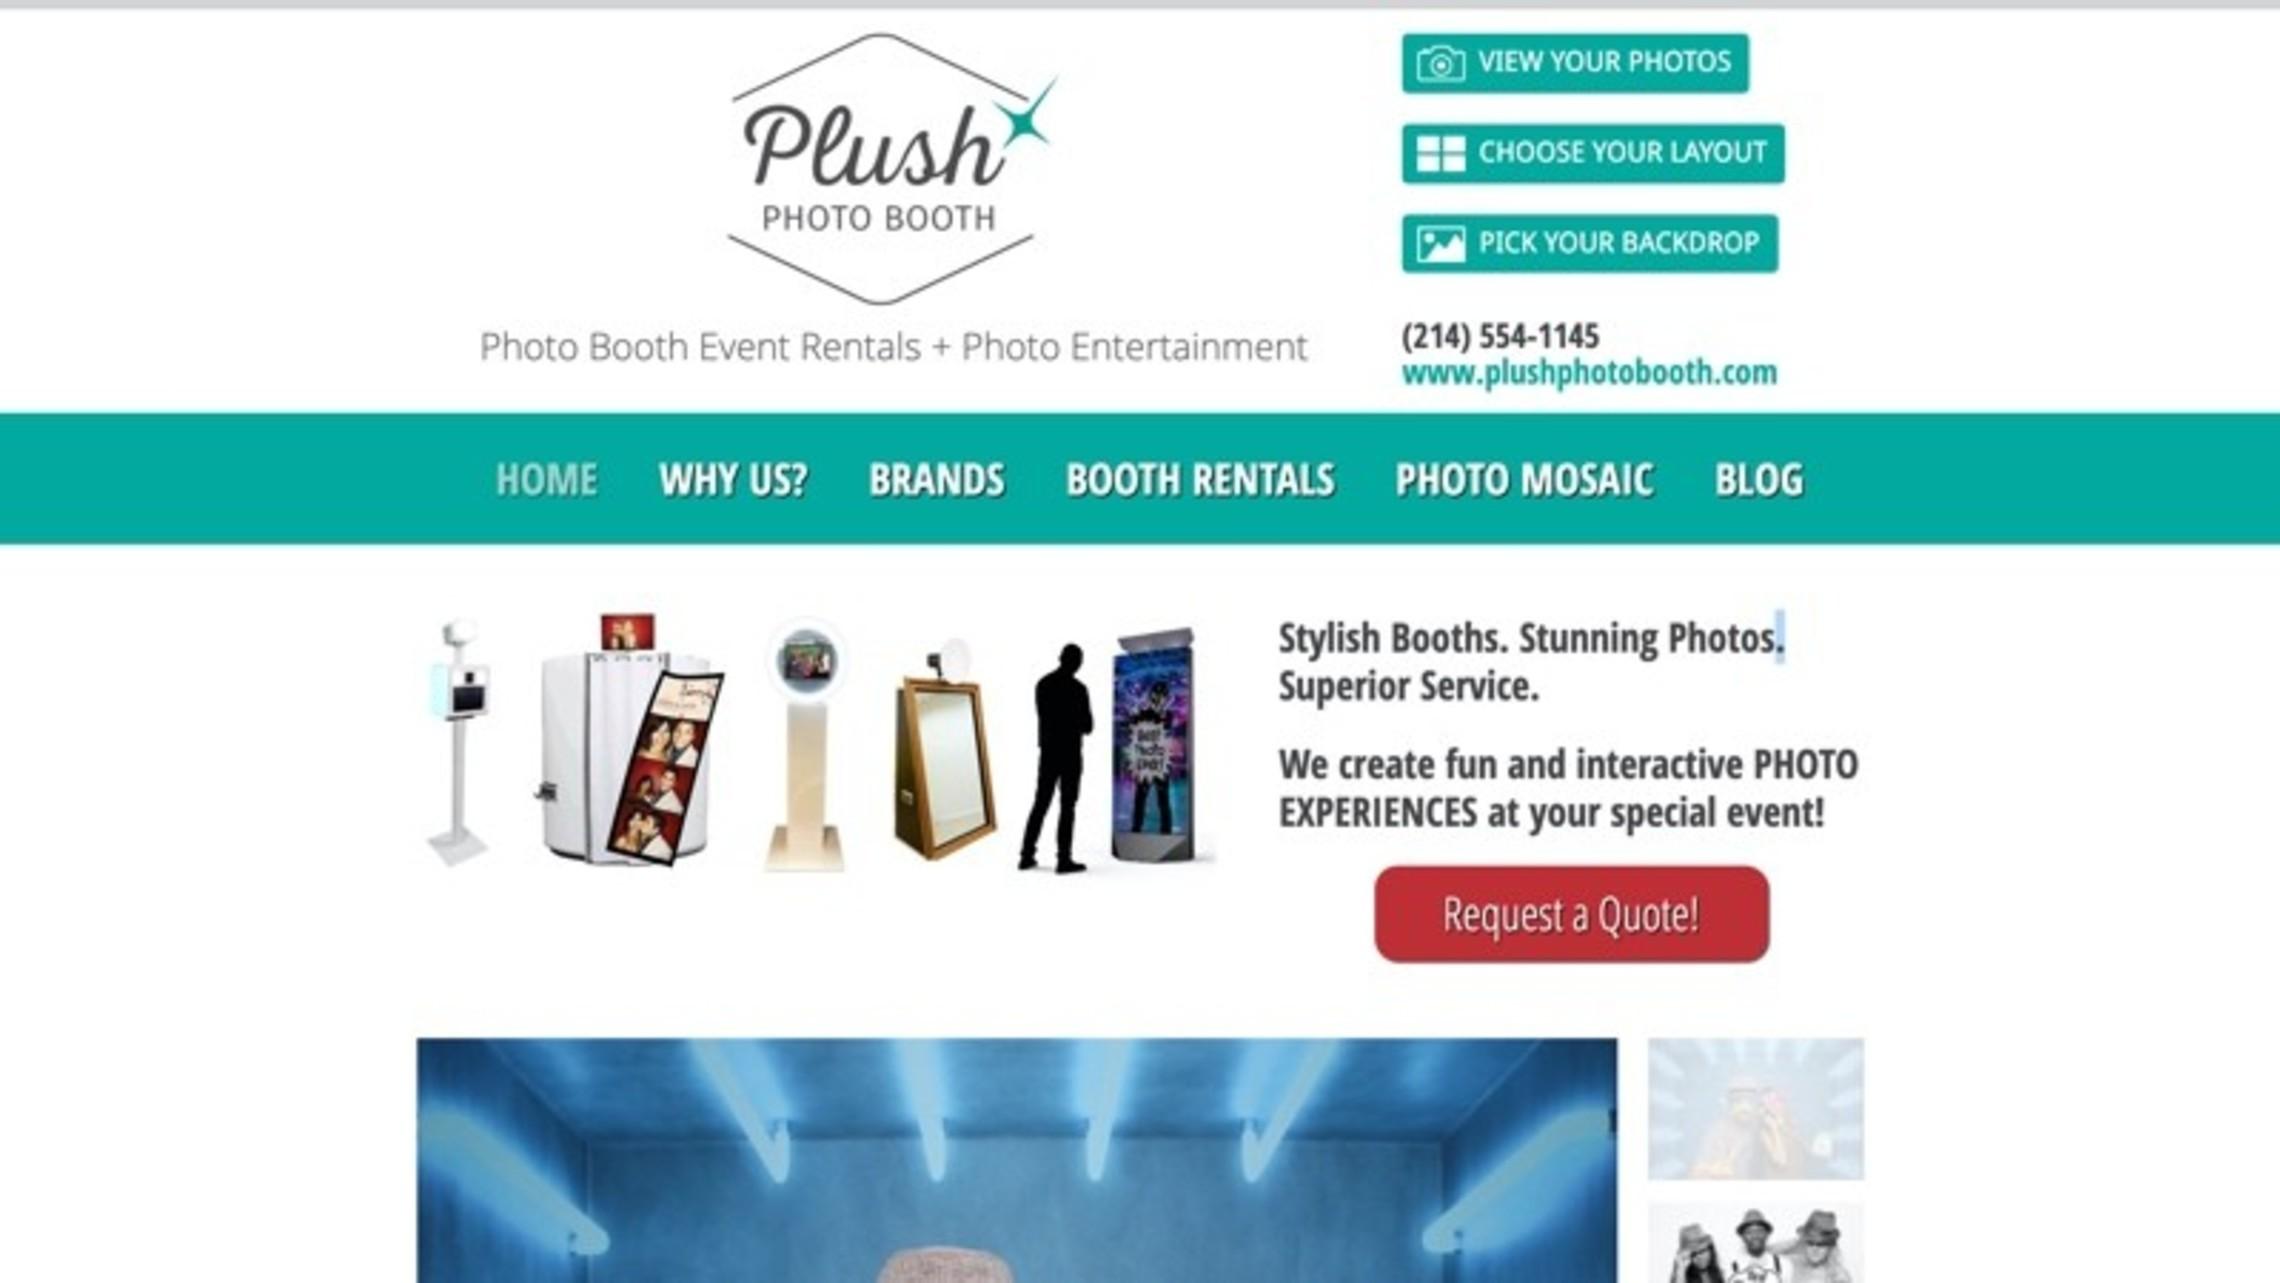 Plush Photo Booth